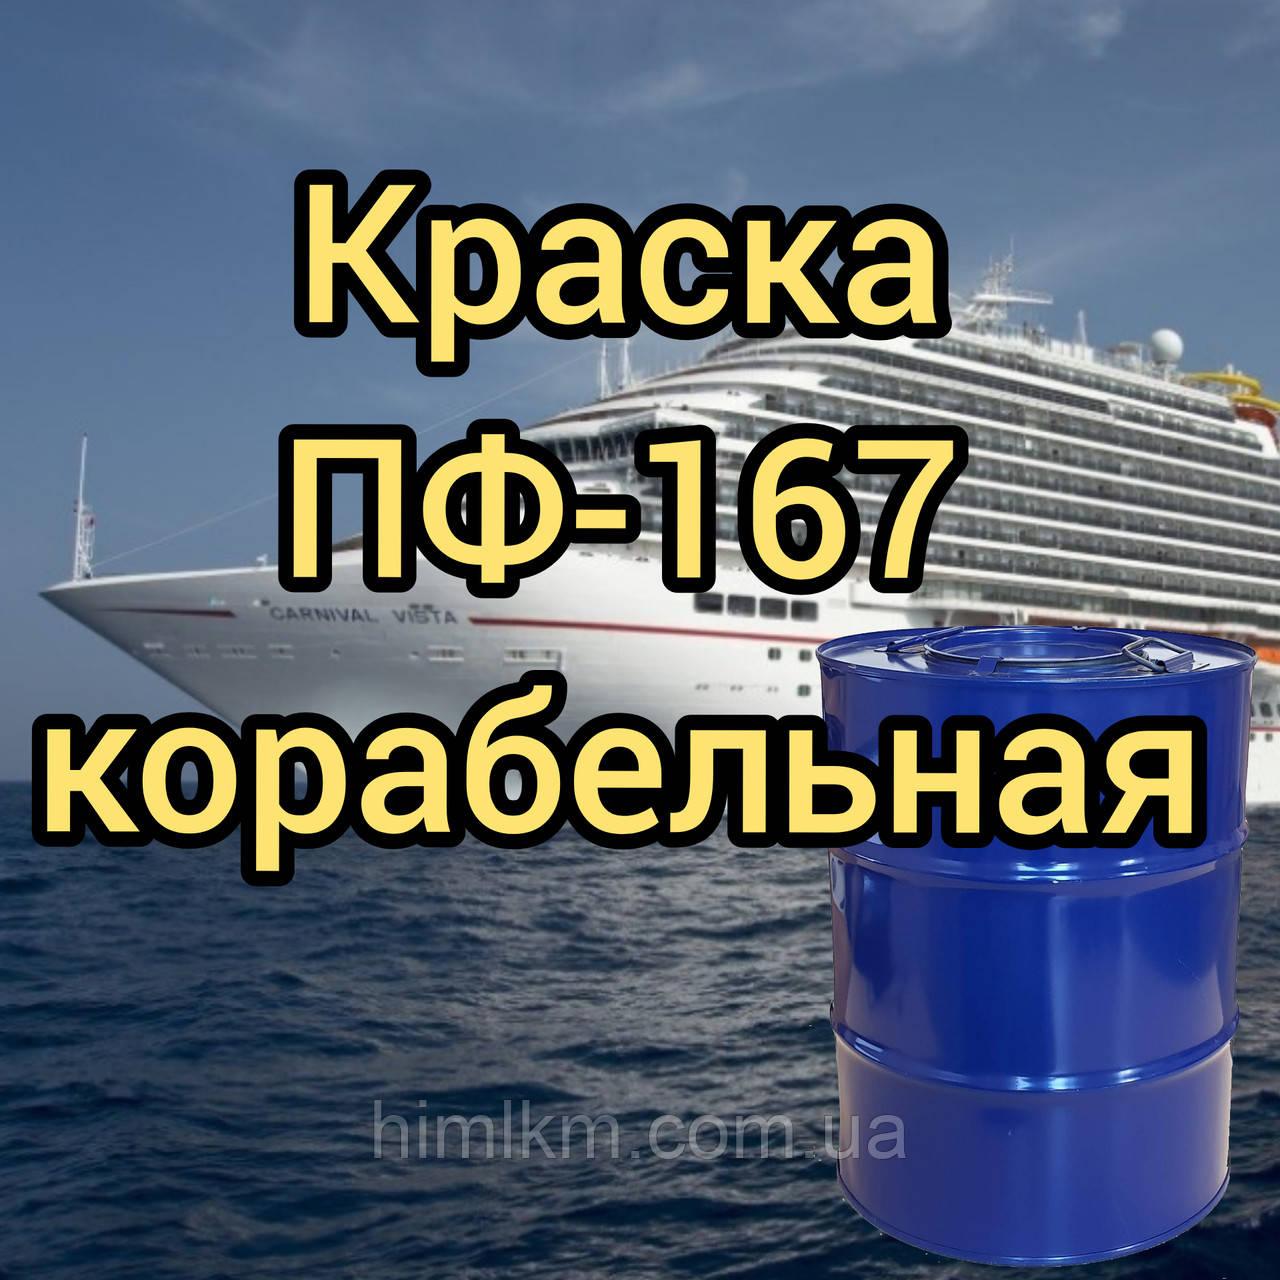 Эмаль ПФ-167 корабельная краска, палубная краска, 50кг